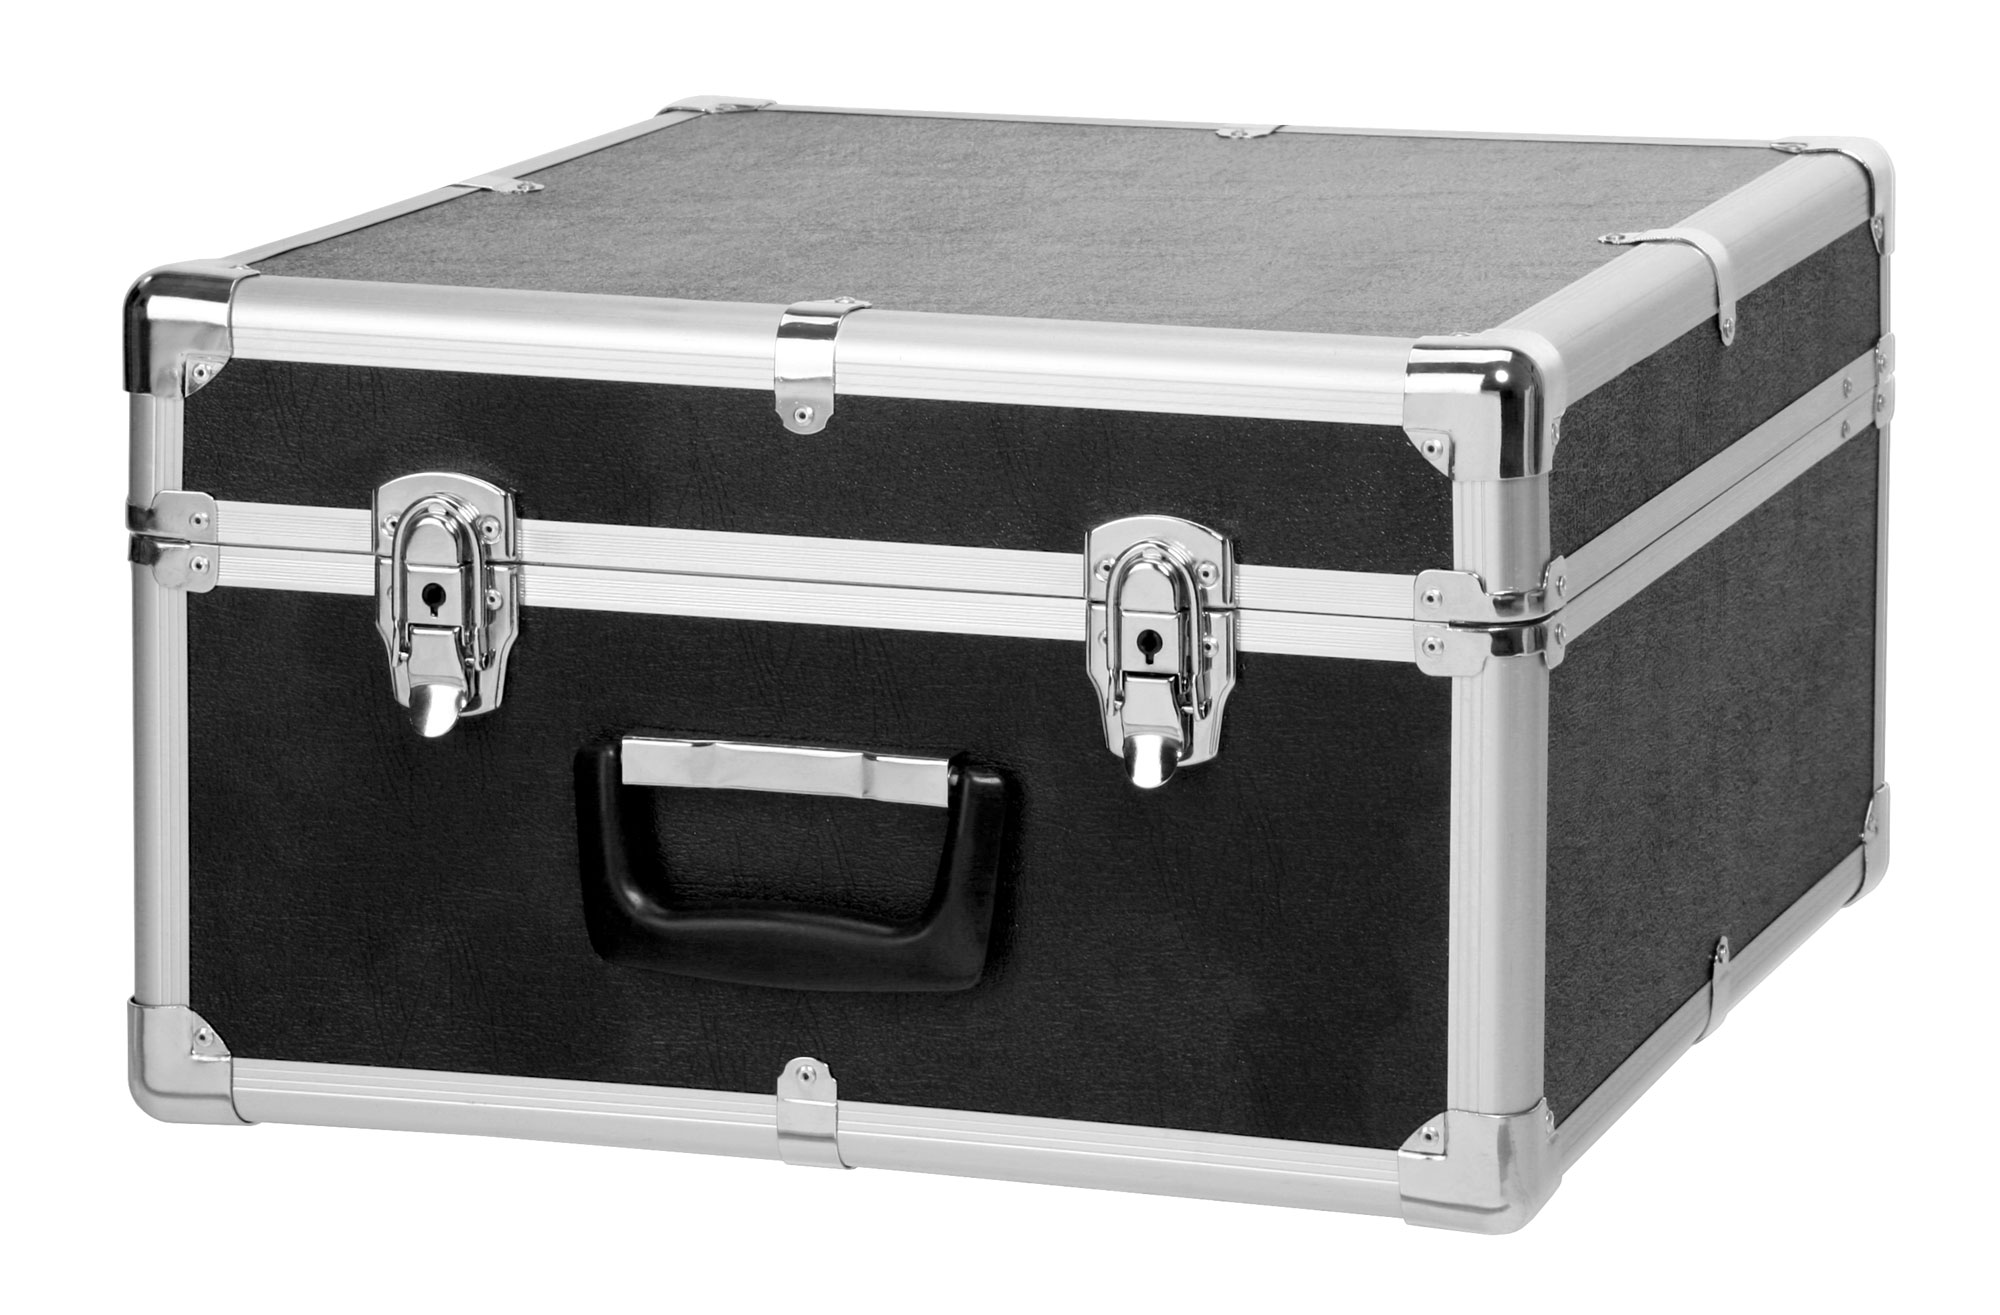 Classic Cantabile Akkordeonkoffer für 48 Bass Akkordeons